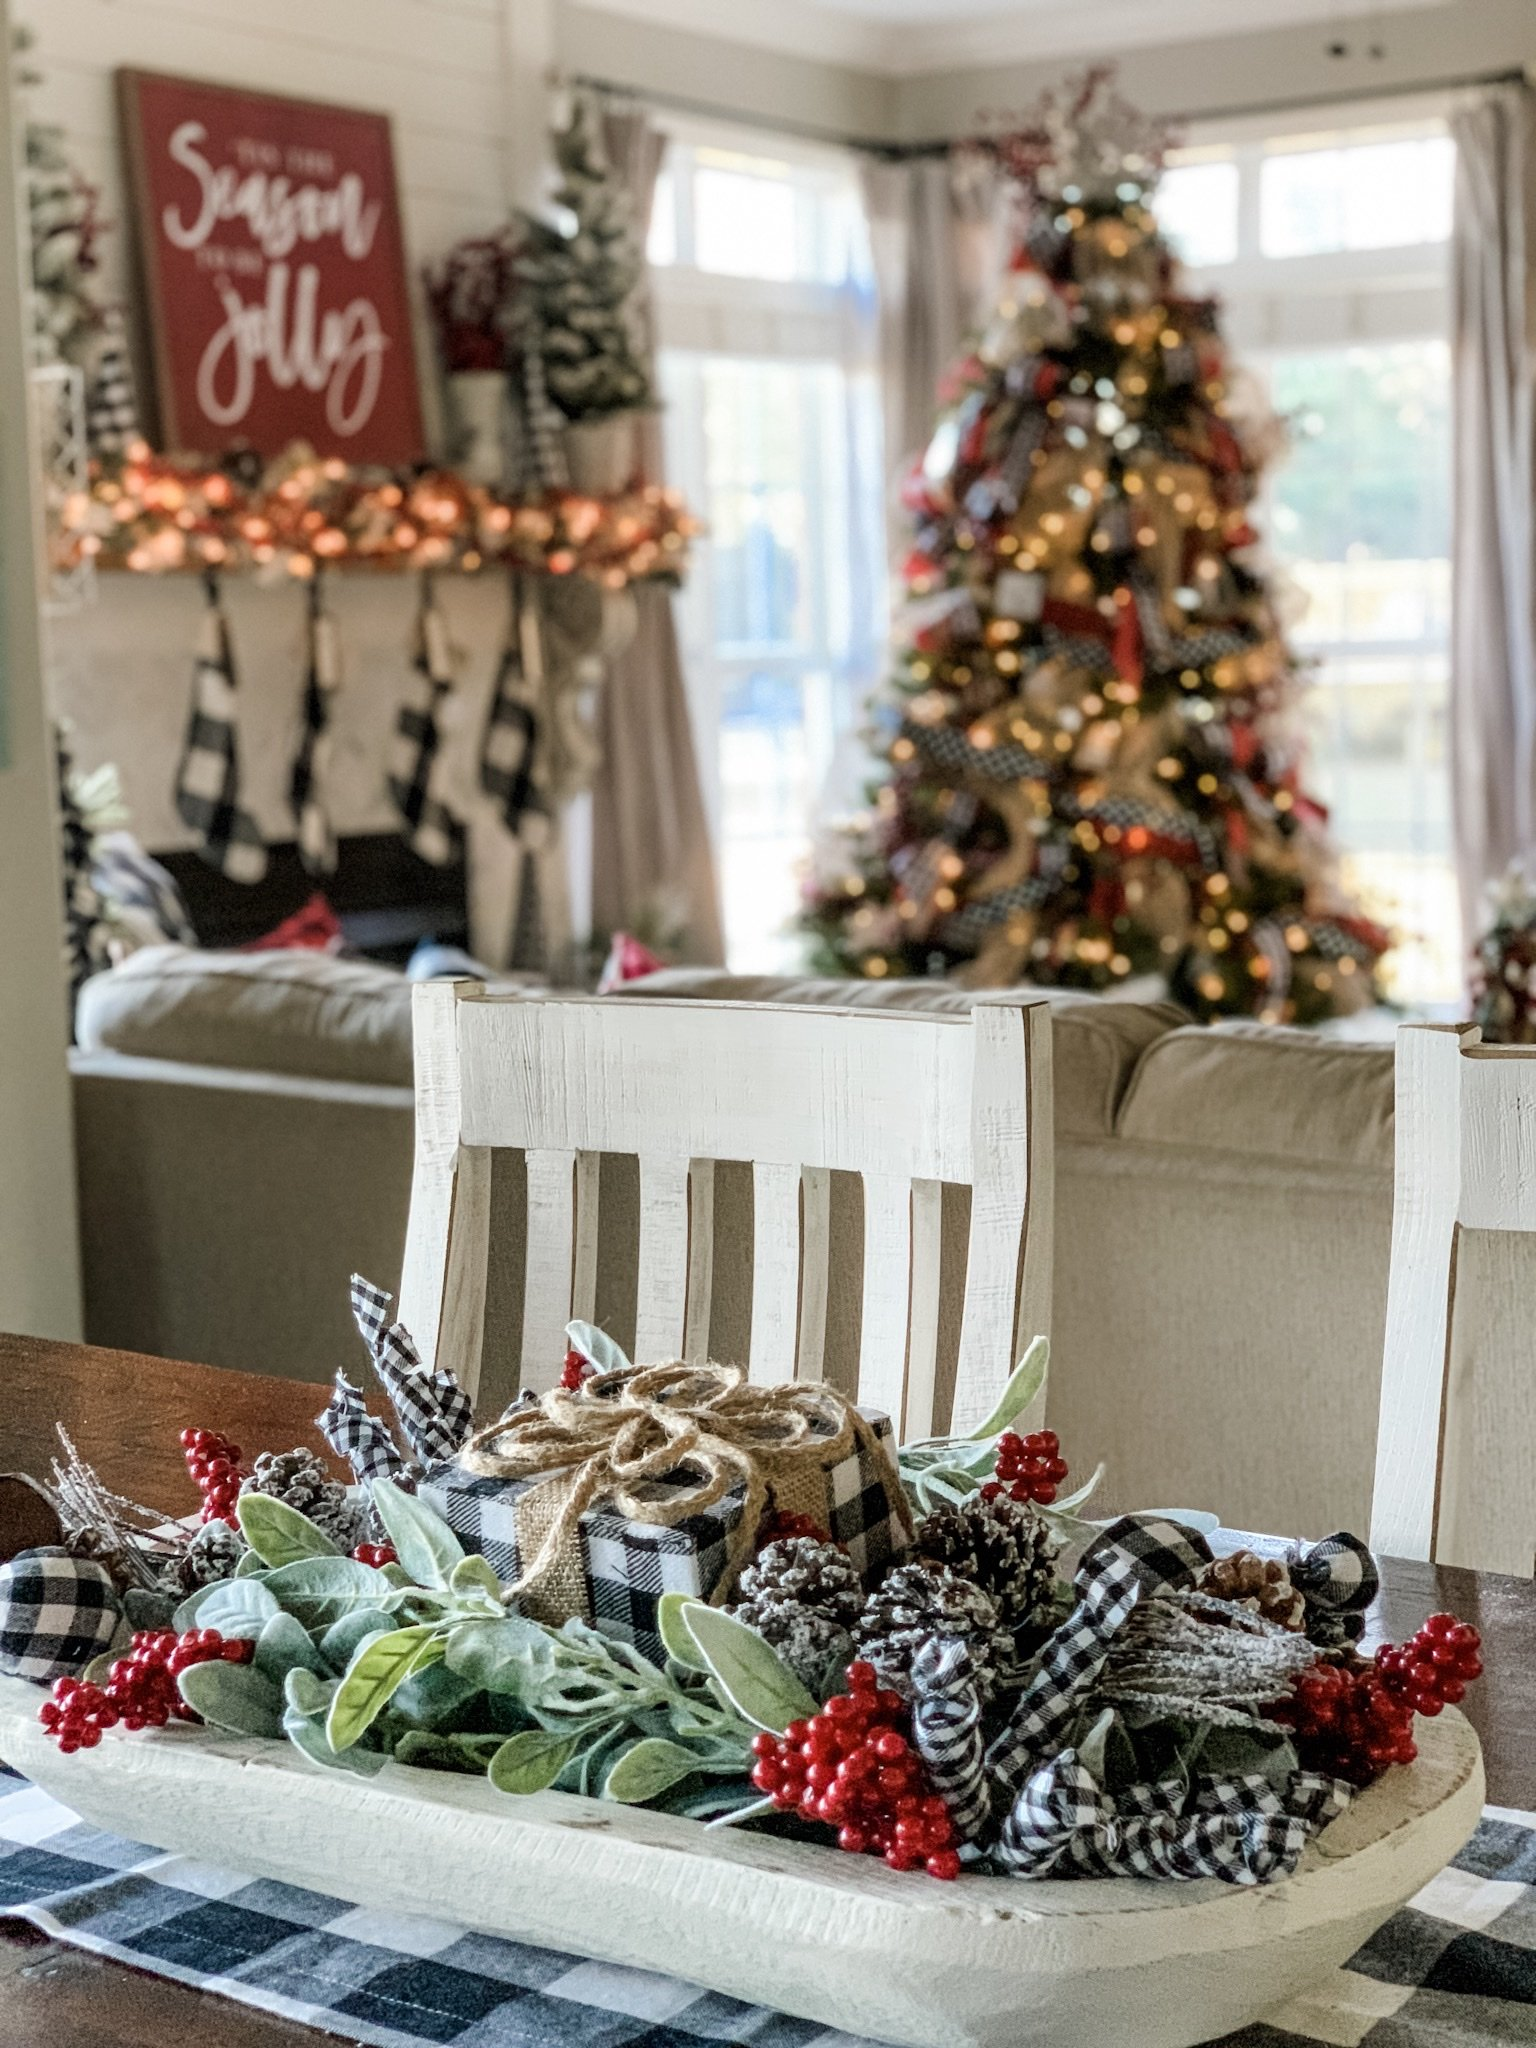 Christmas centerpiece idea using a dough bowl for a festive look!